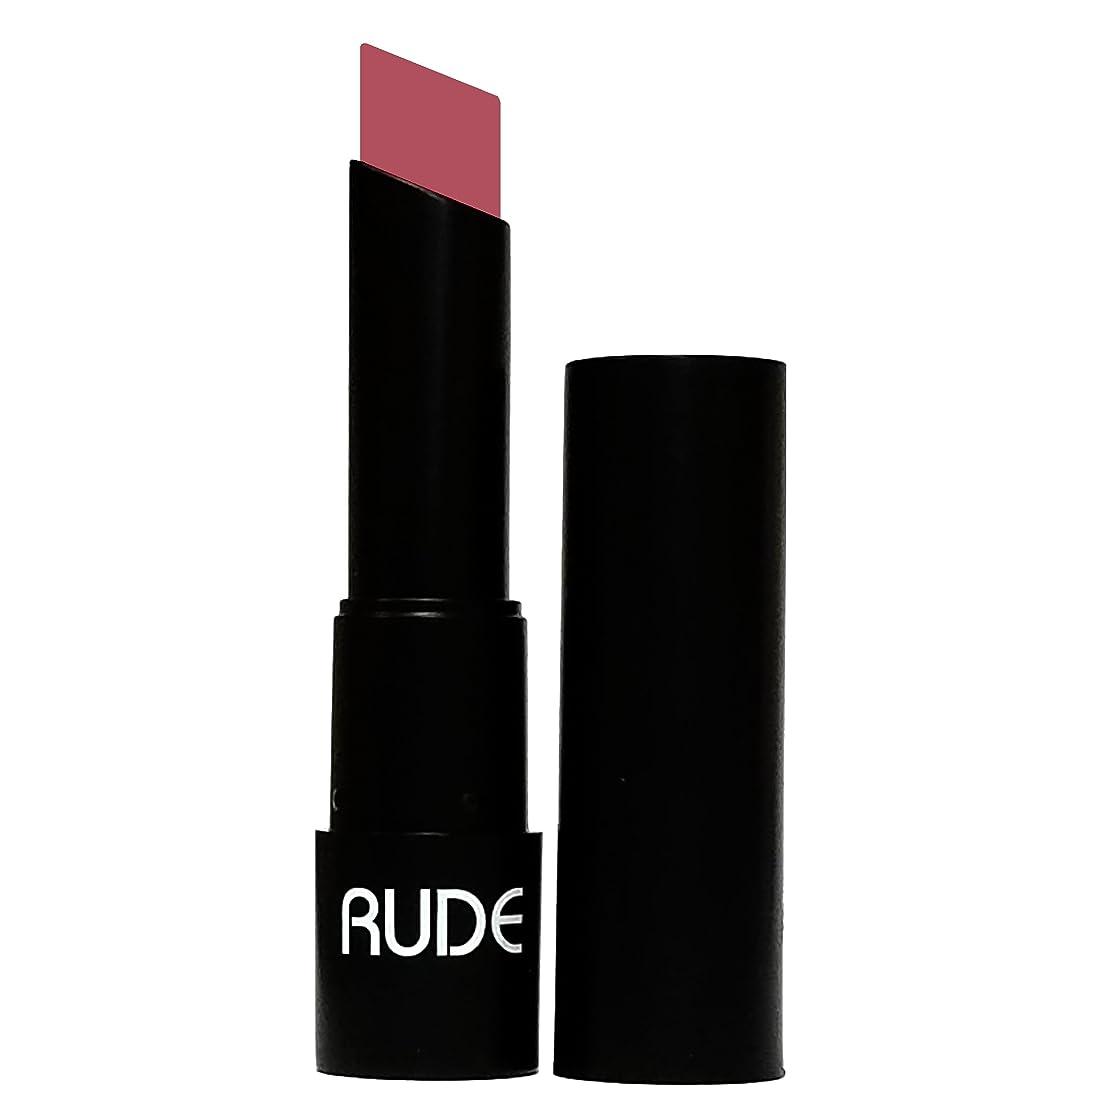 食欲破壊的後(6 Pack) RUDE Attitude Matte Lipstick - Arrogant (並行輸入品)